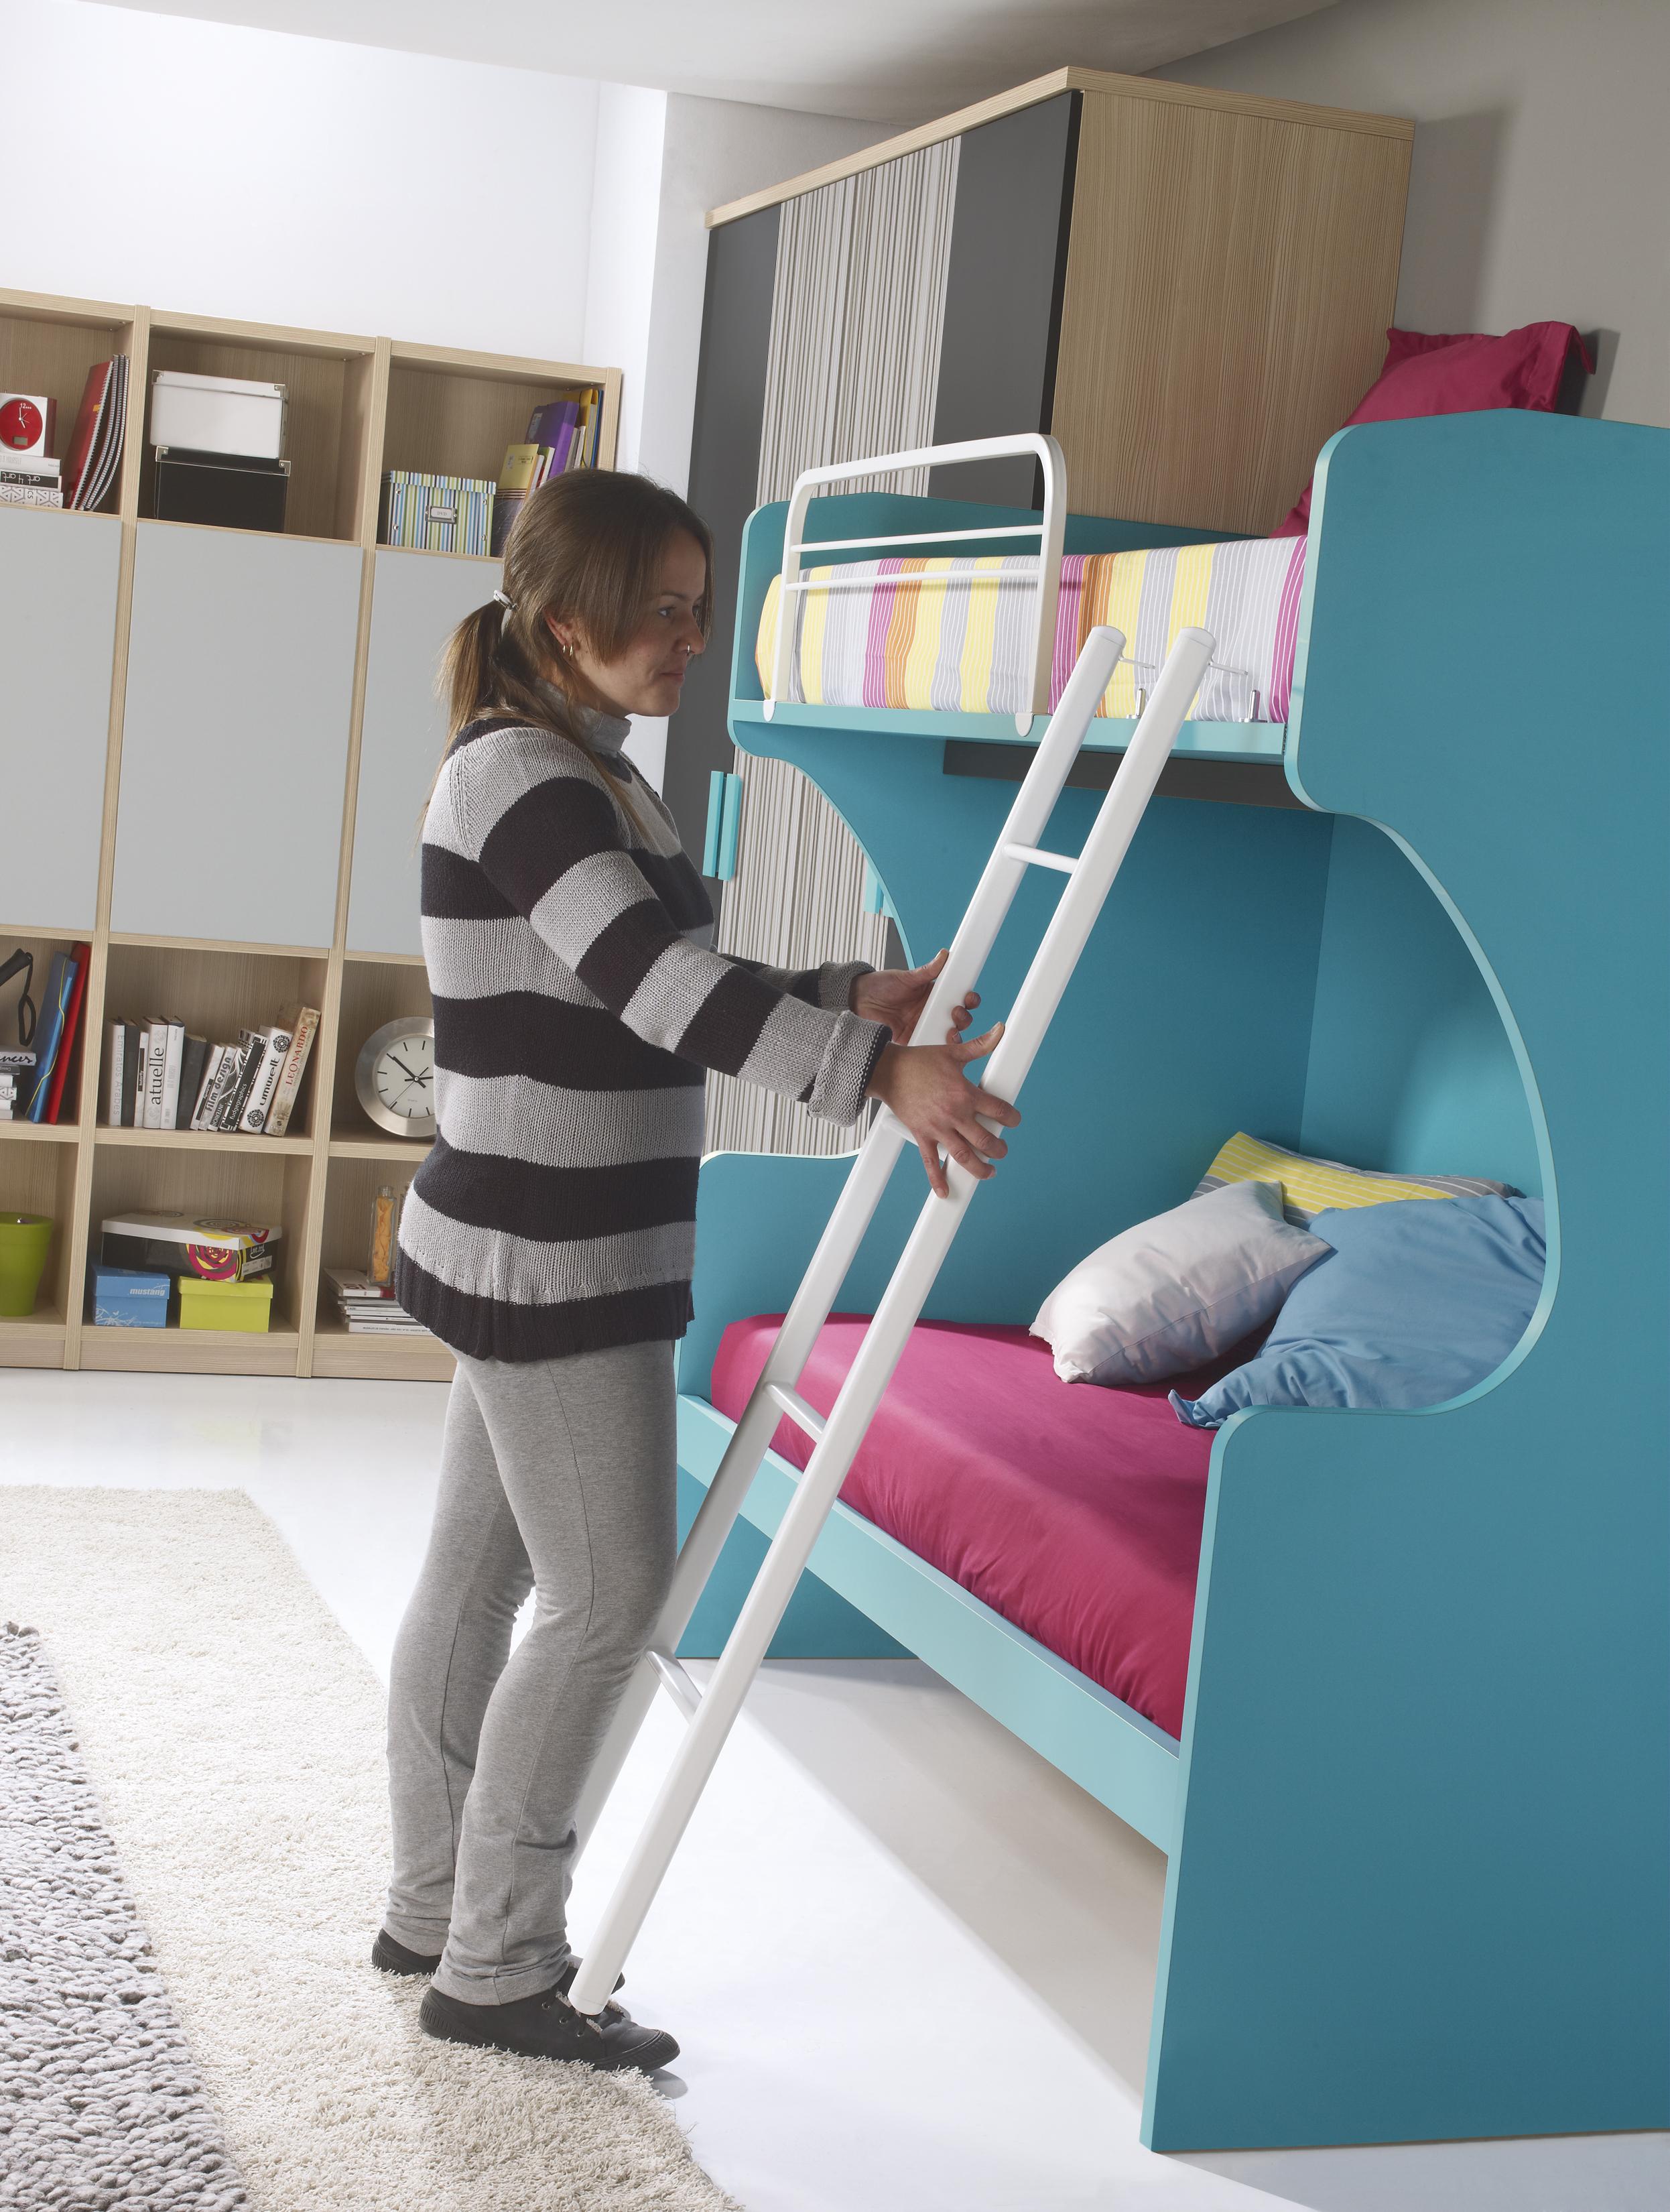 Dormitorios Juveniles Nietohogar # Muebles Nieto Andujar